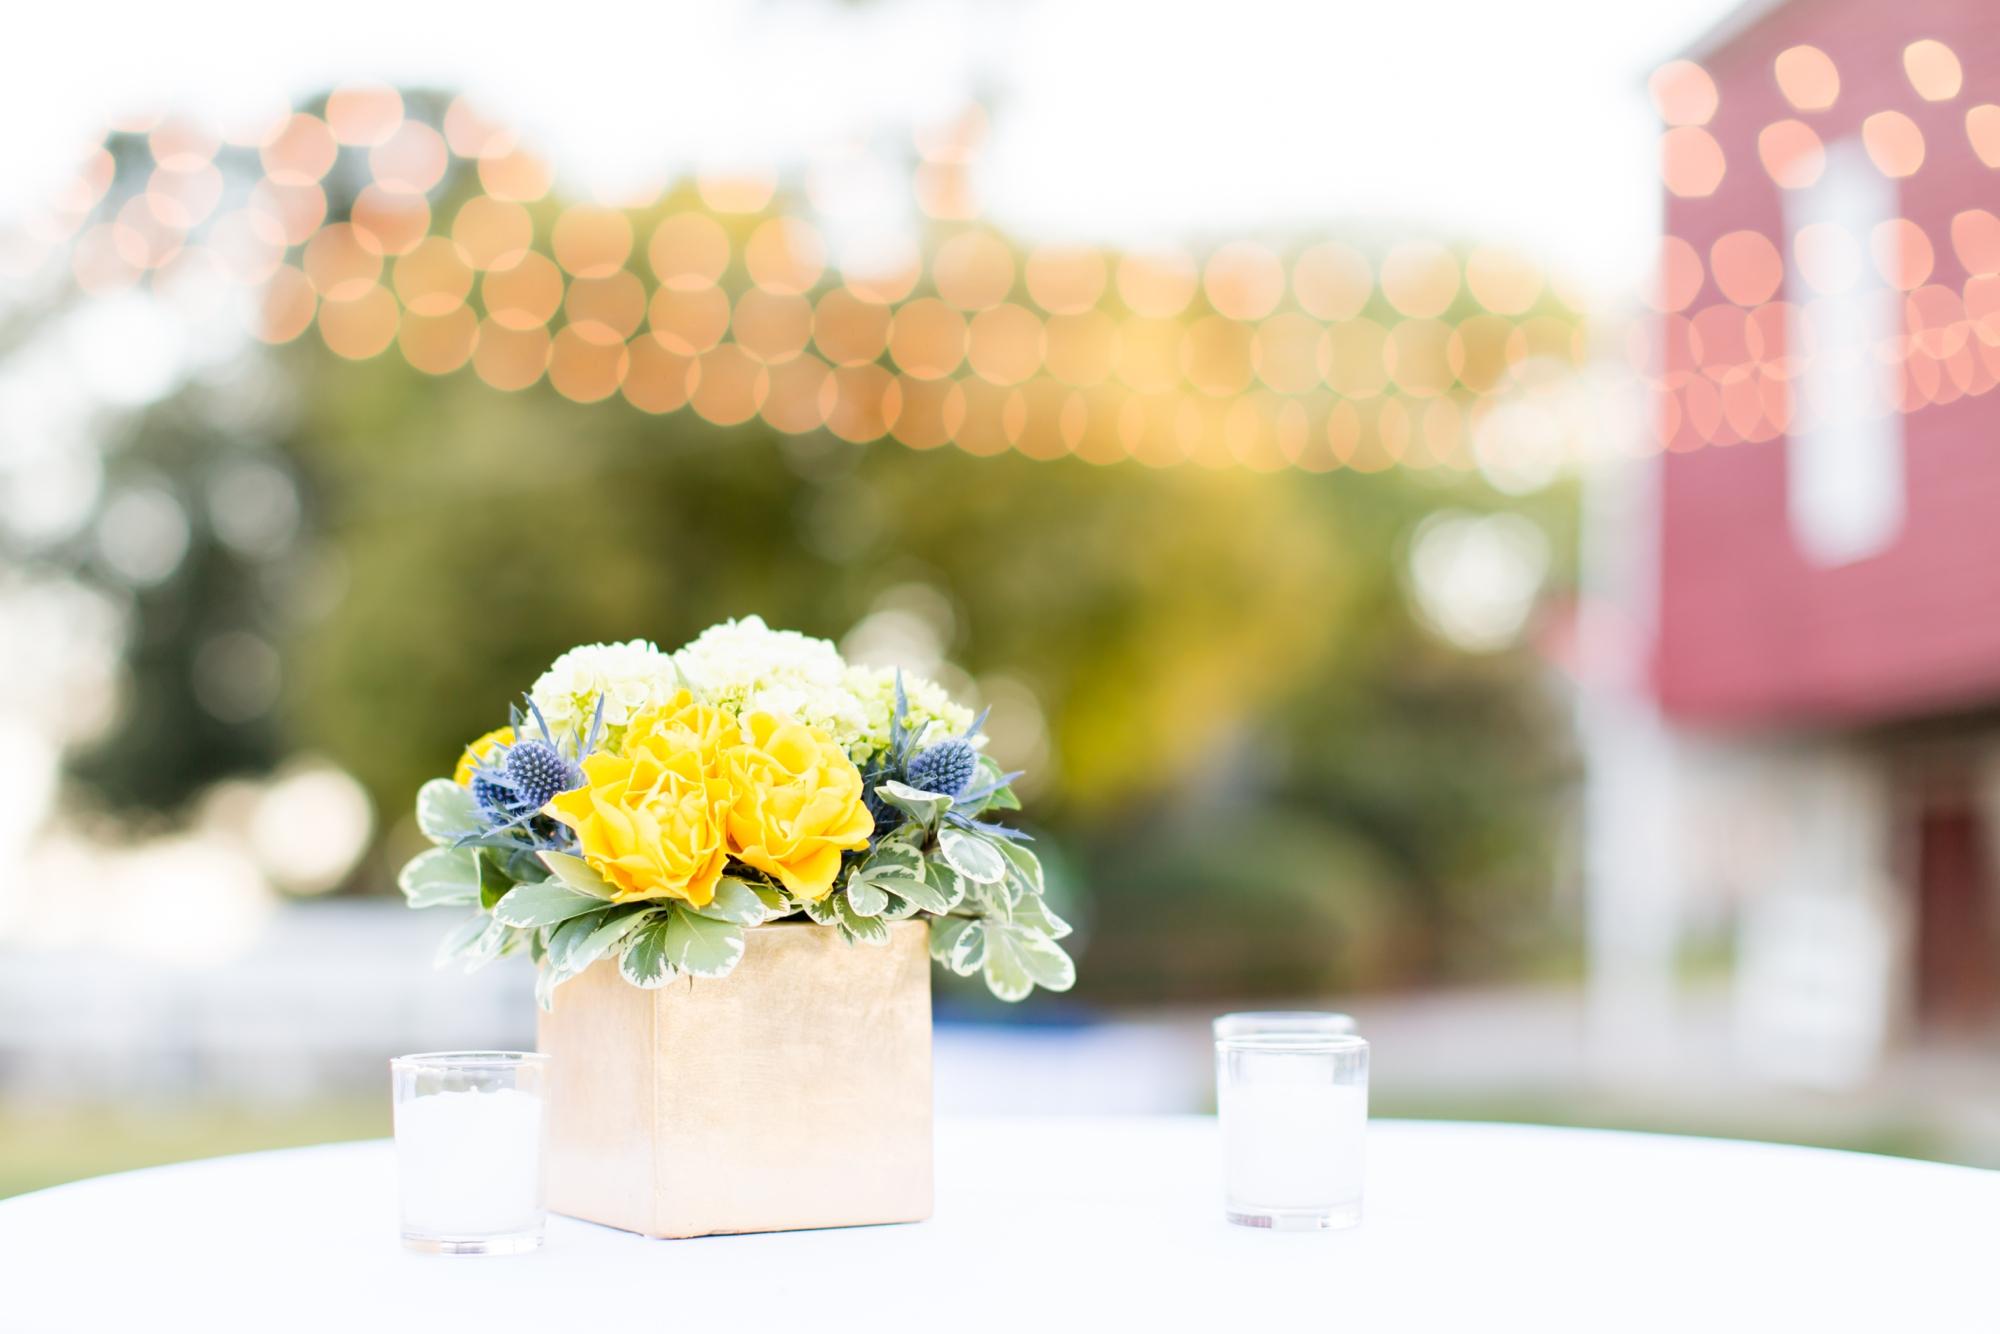 7-Miano Wedding Reception-806_anna grace photography maryland wedding photographer rockland estates.jpg